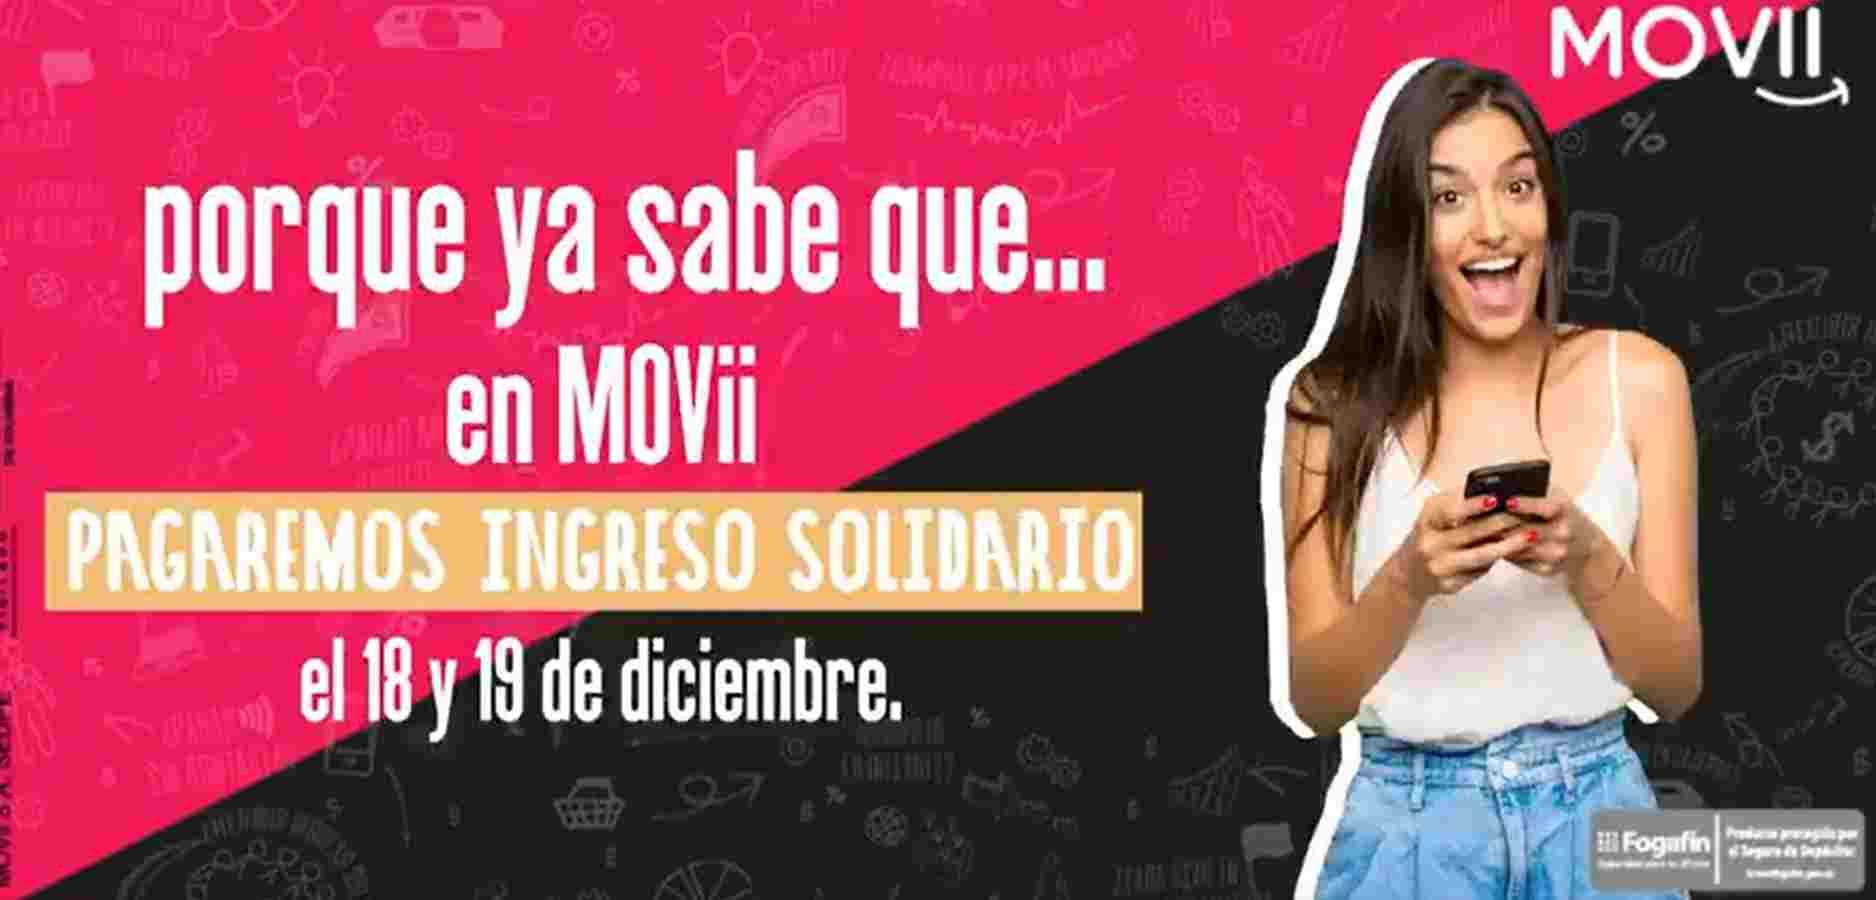 Ingreso Solidario en MOVii: ¿Es obligatoria la tarjeta?